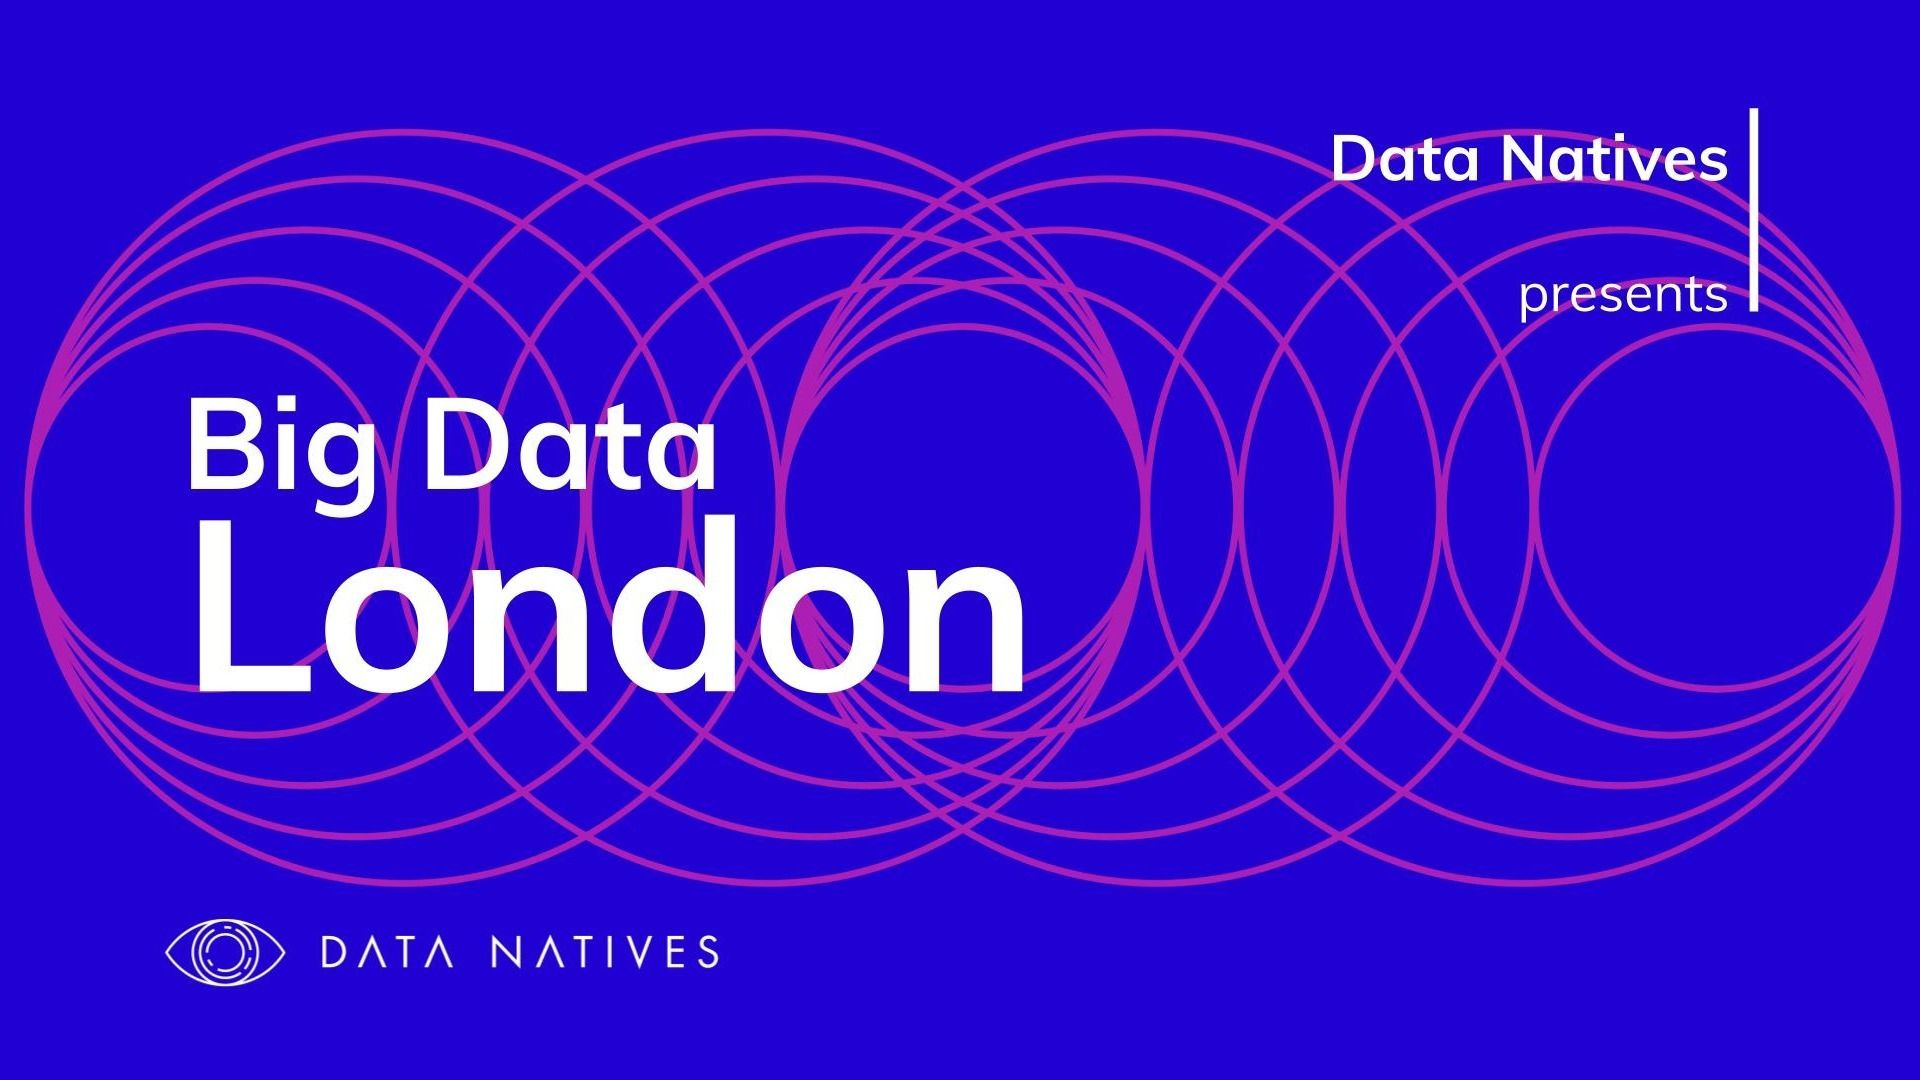 Data Natives London